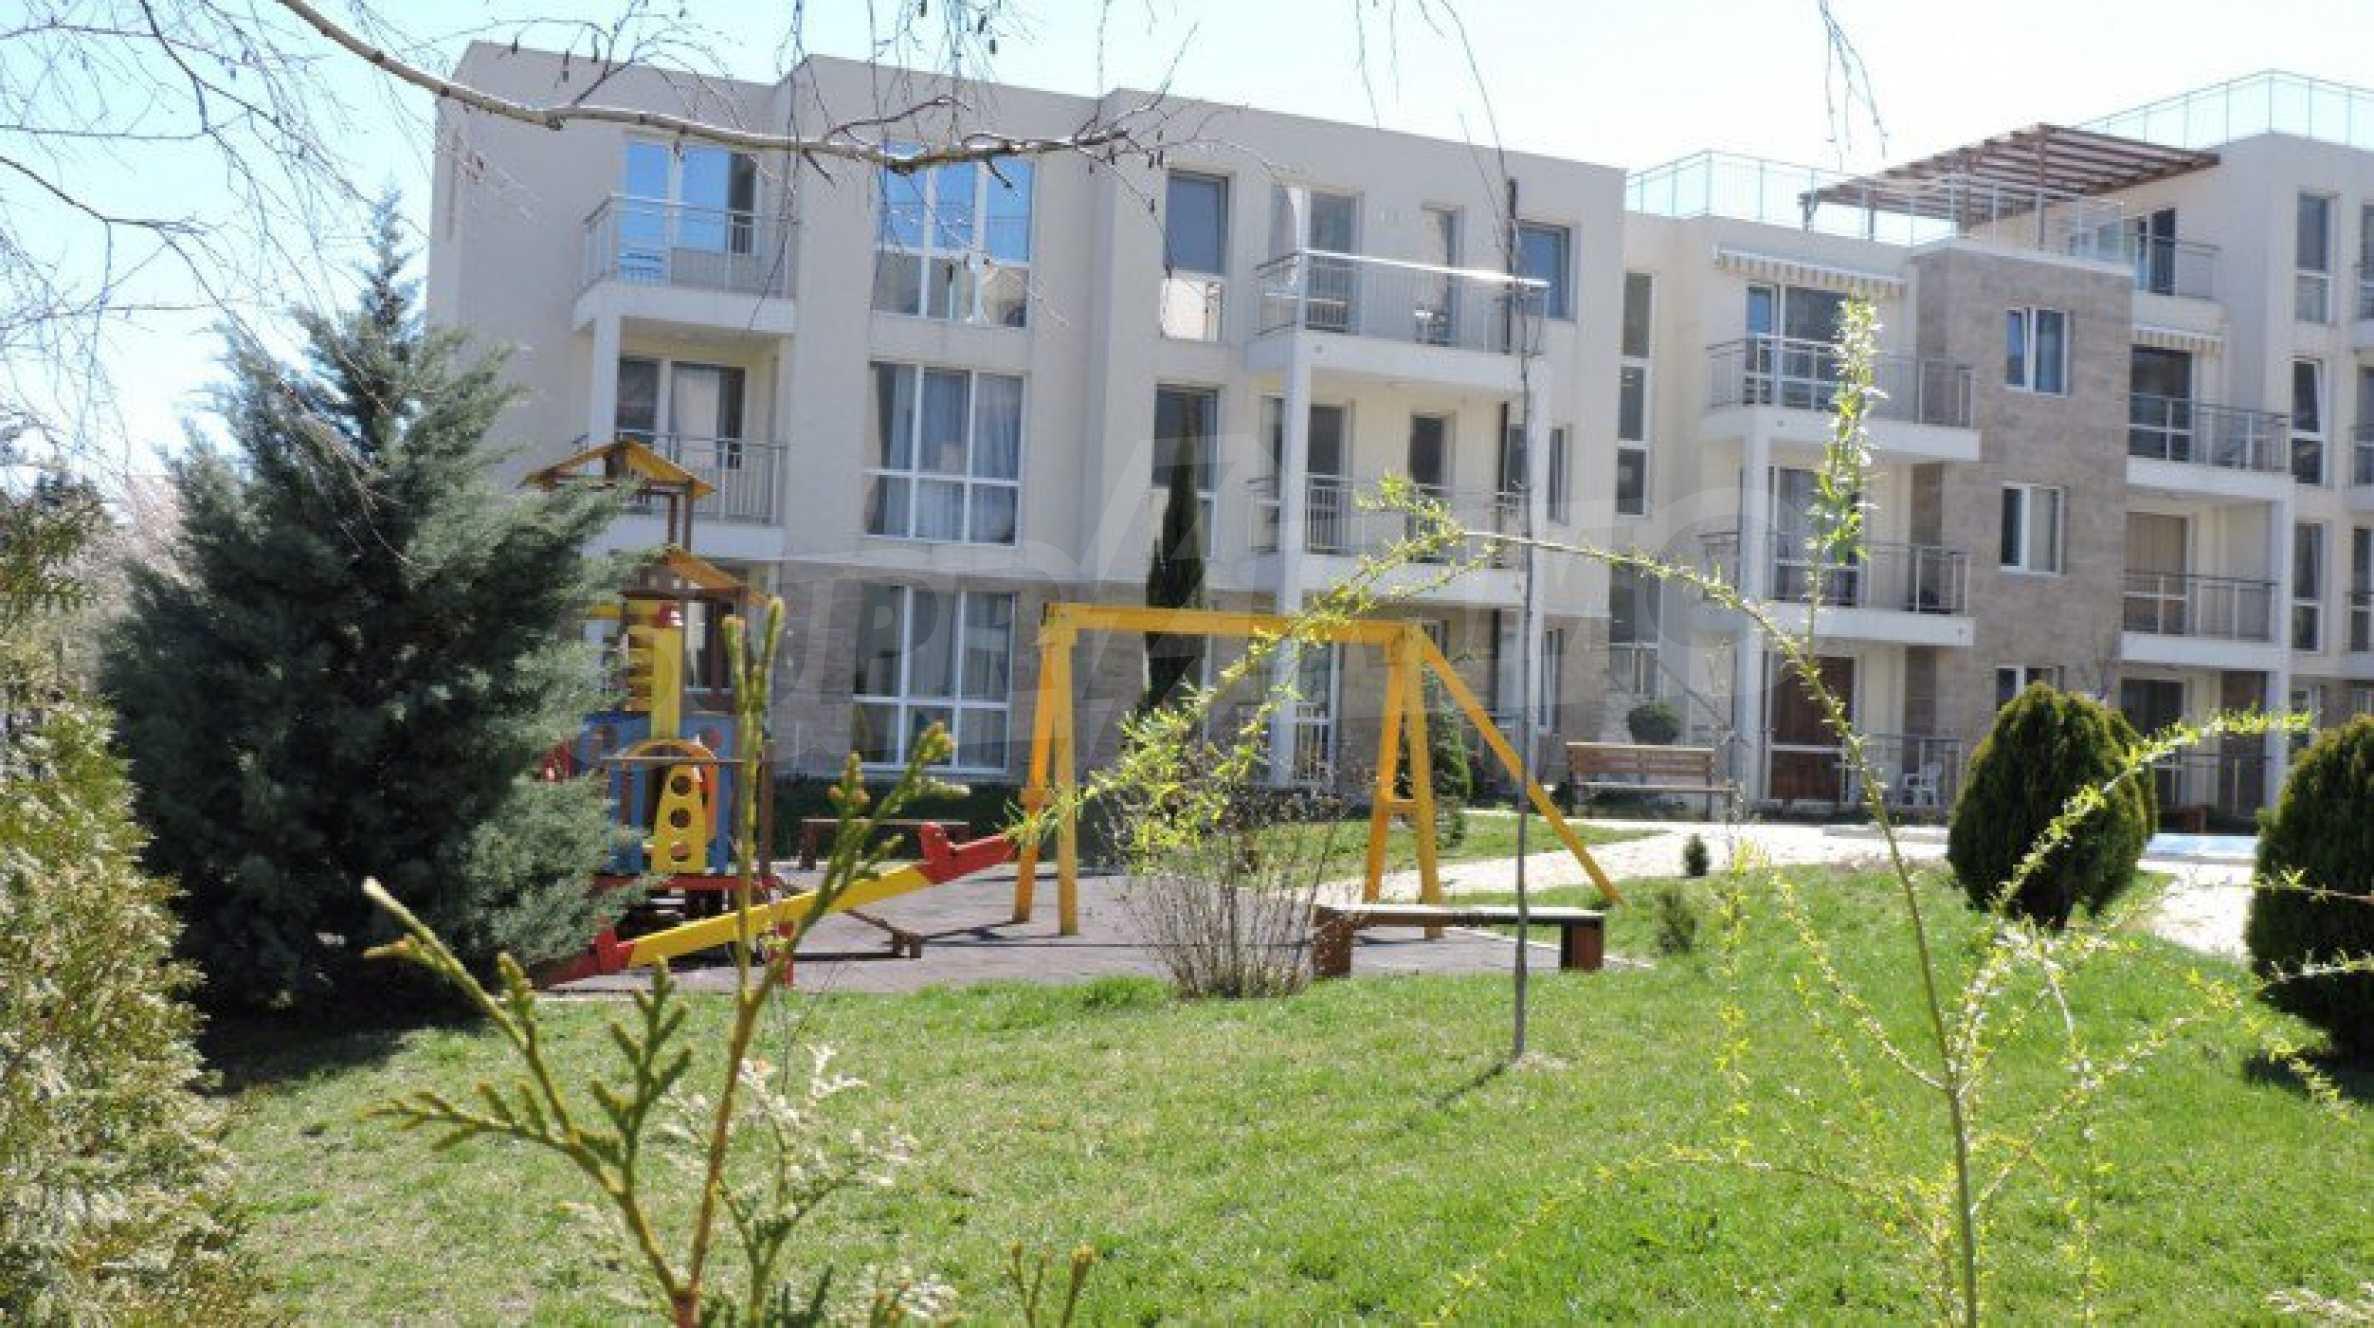 Тристаен апартамент близо до плажа в Бяла 14